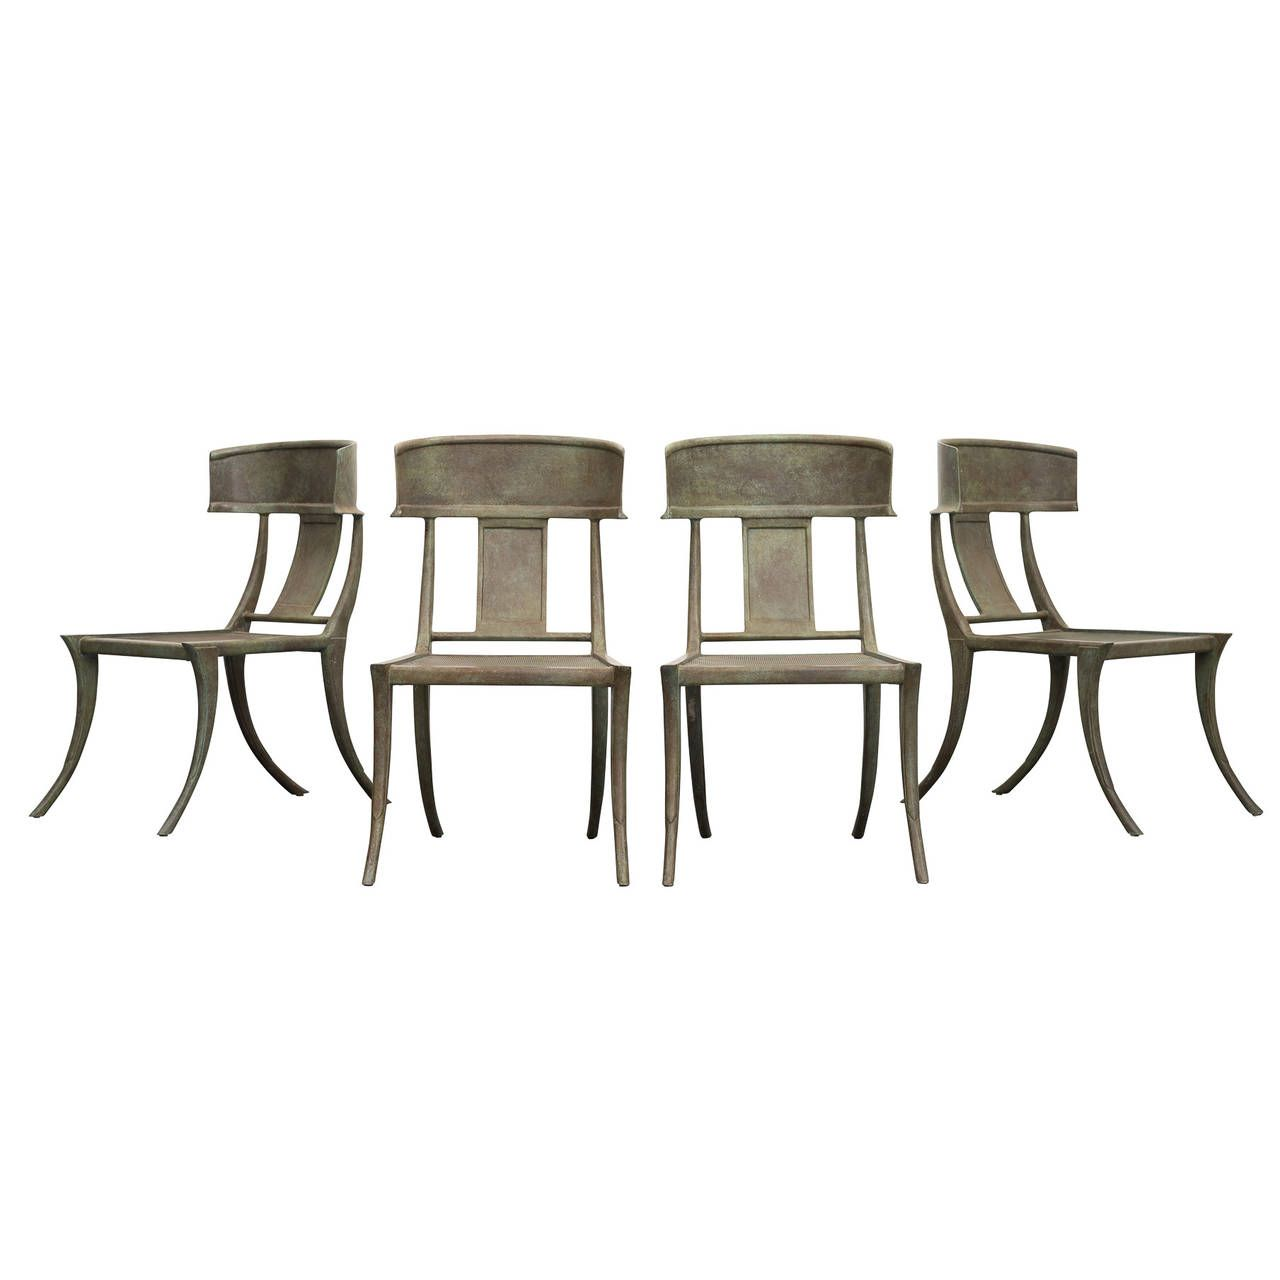 Michael Taylor Set of Four Metal Klismos Chairs  7stdibs.com